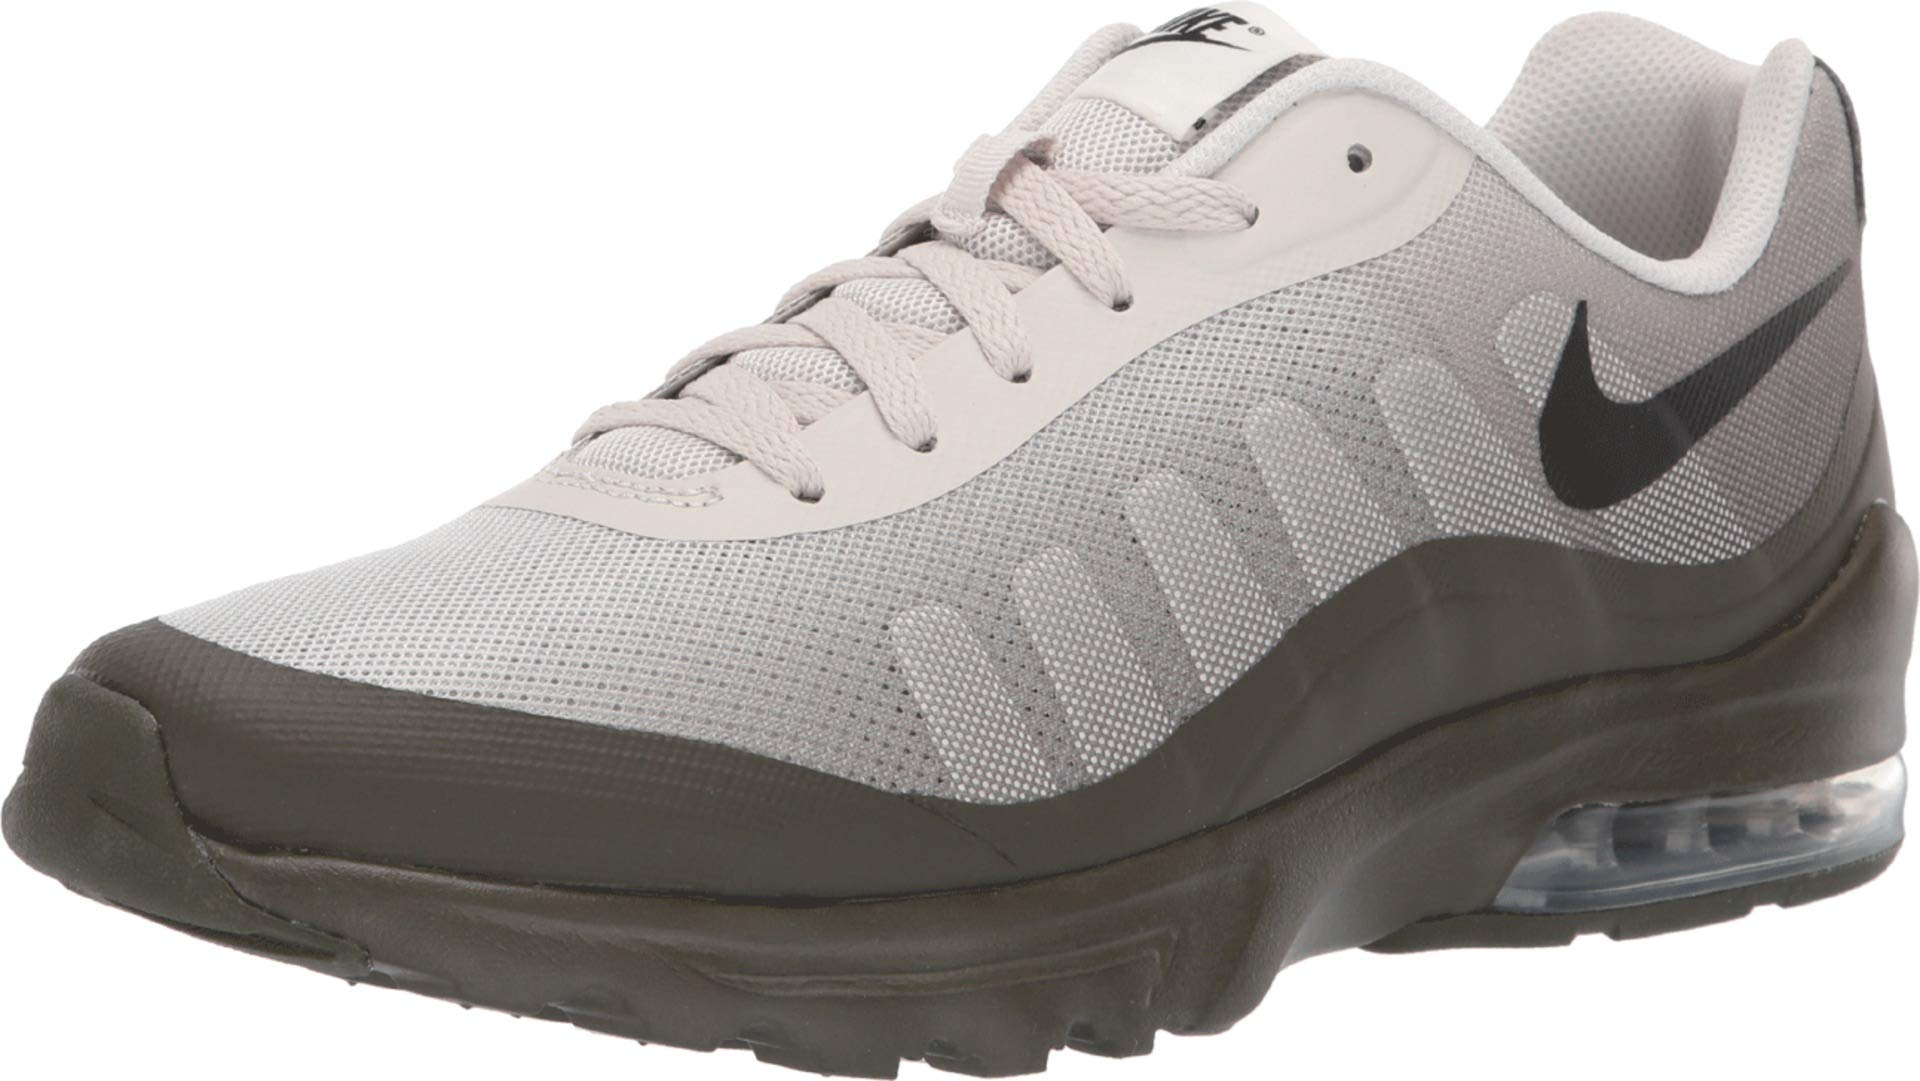 14cdecc188 Galleon - NIKE Men's Air Max Invigor Print Shoe Light Bone/Black/Cargo  Khaki Size 9 M US